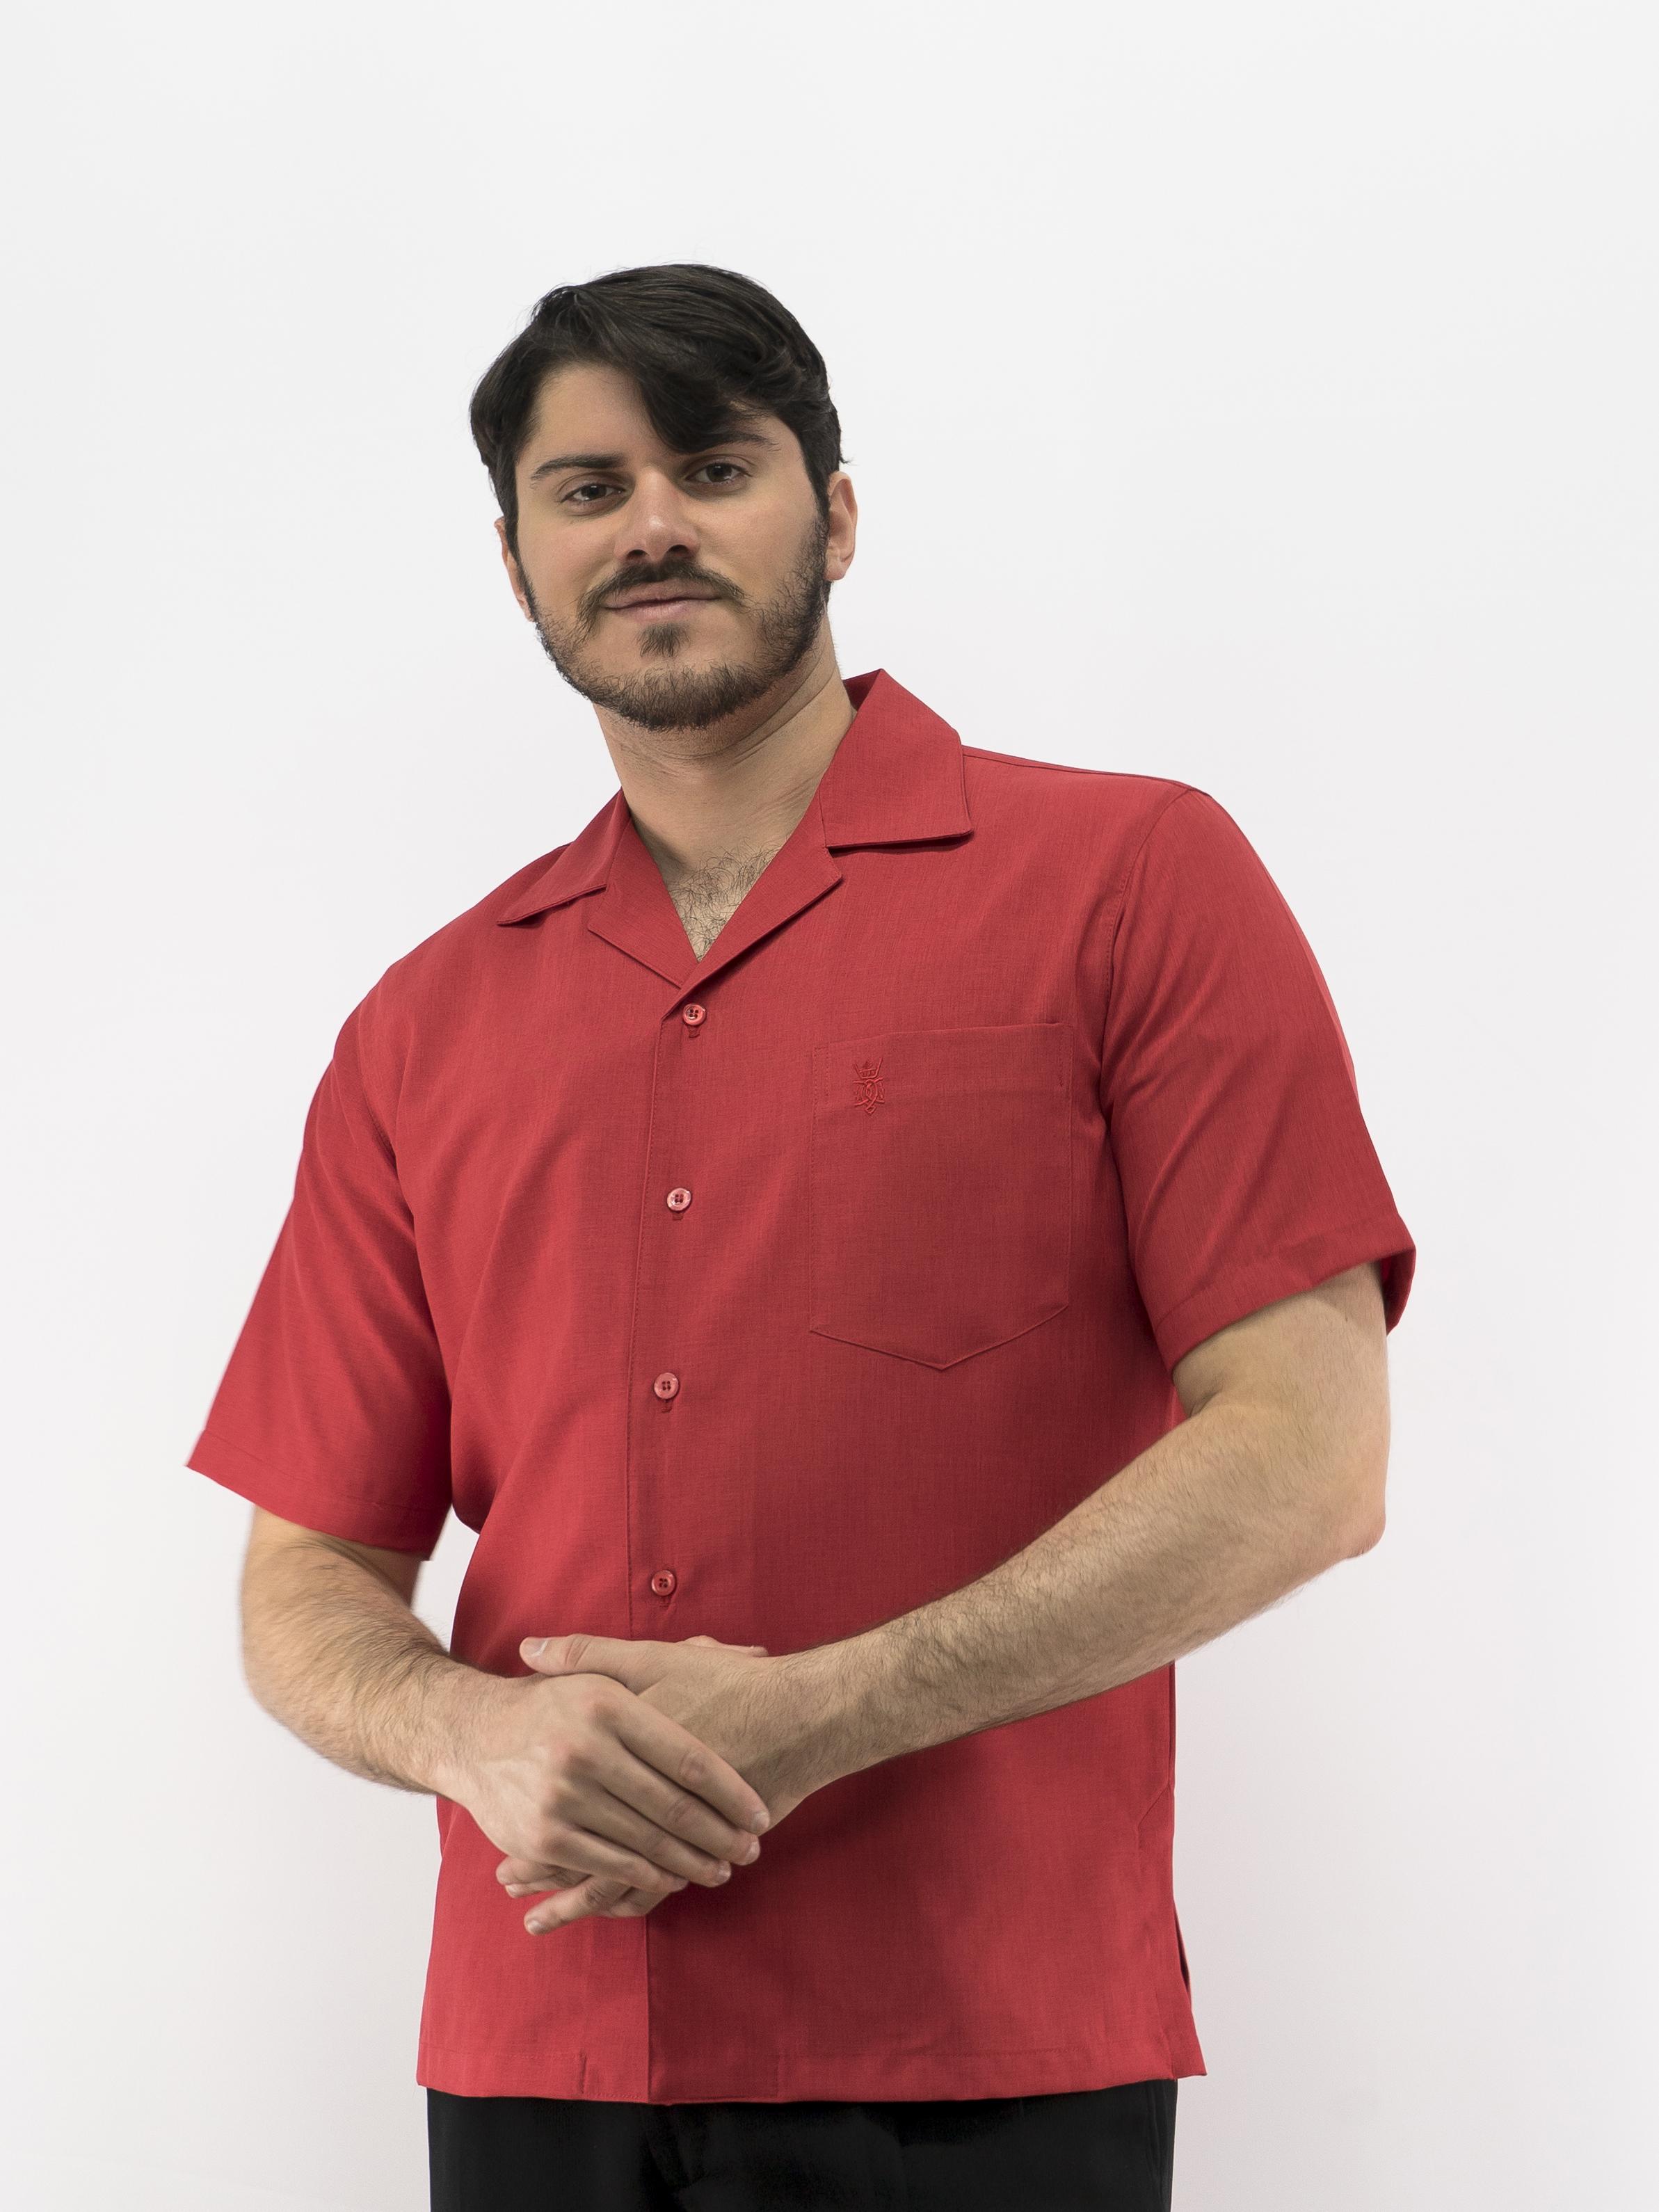 78f451b97b Uniform Shirt Men s Casual Shirt Red D Accord 5152U Made in USA SOLD ...